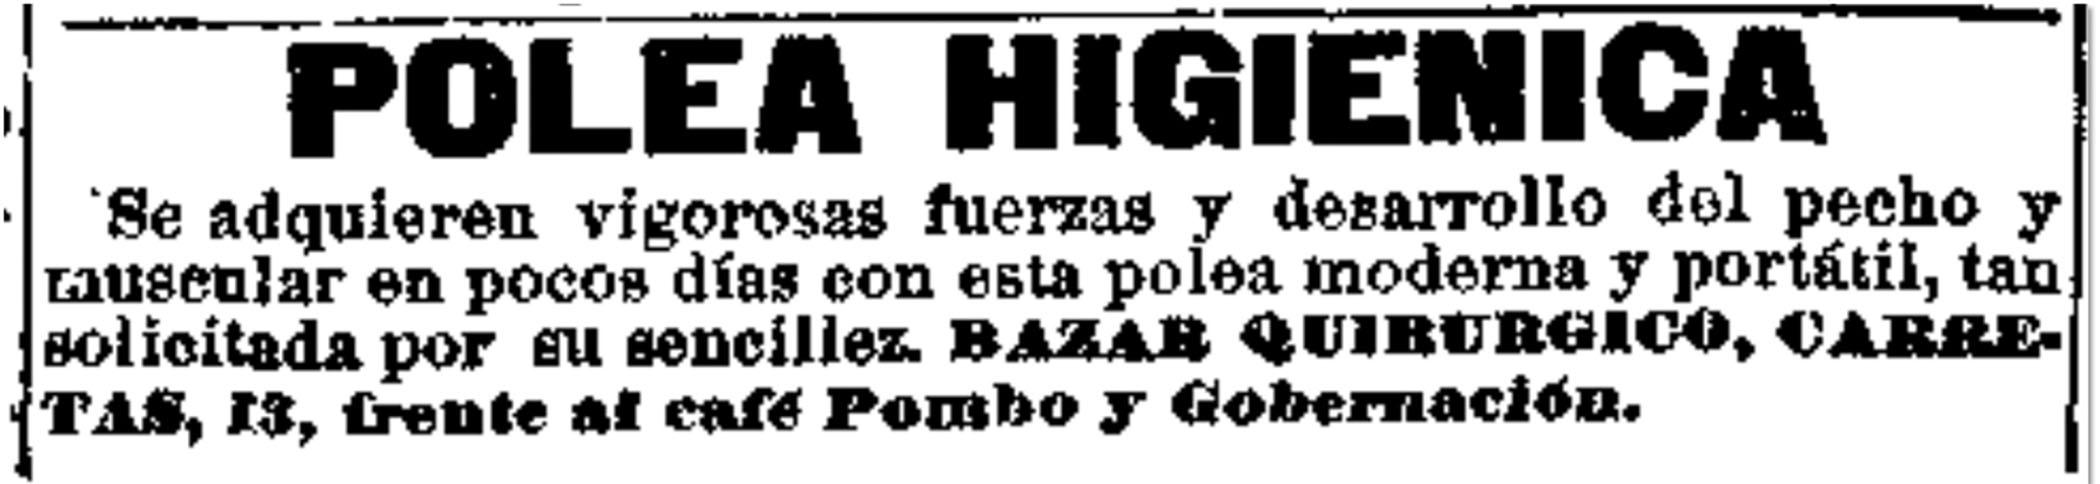 Heraldo de Madrid, 7 de noviembre de 1904, p. 4